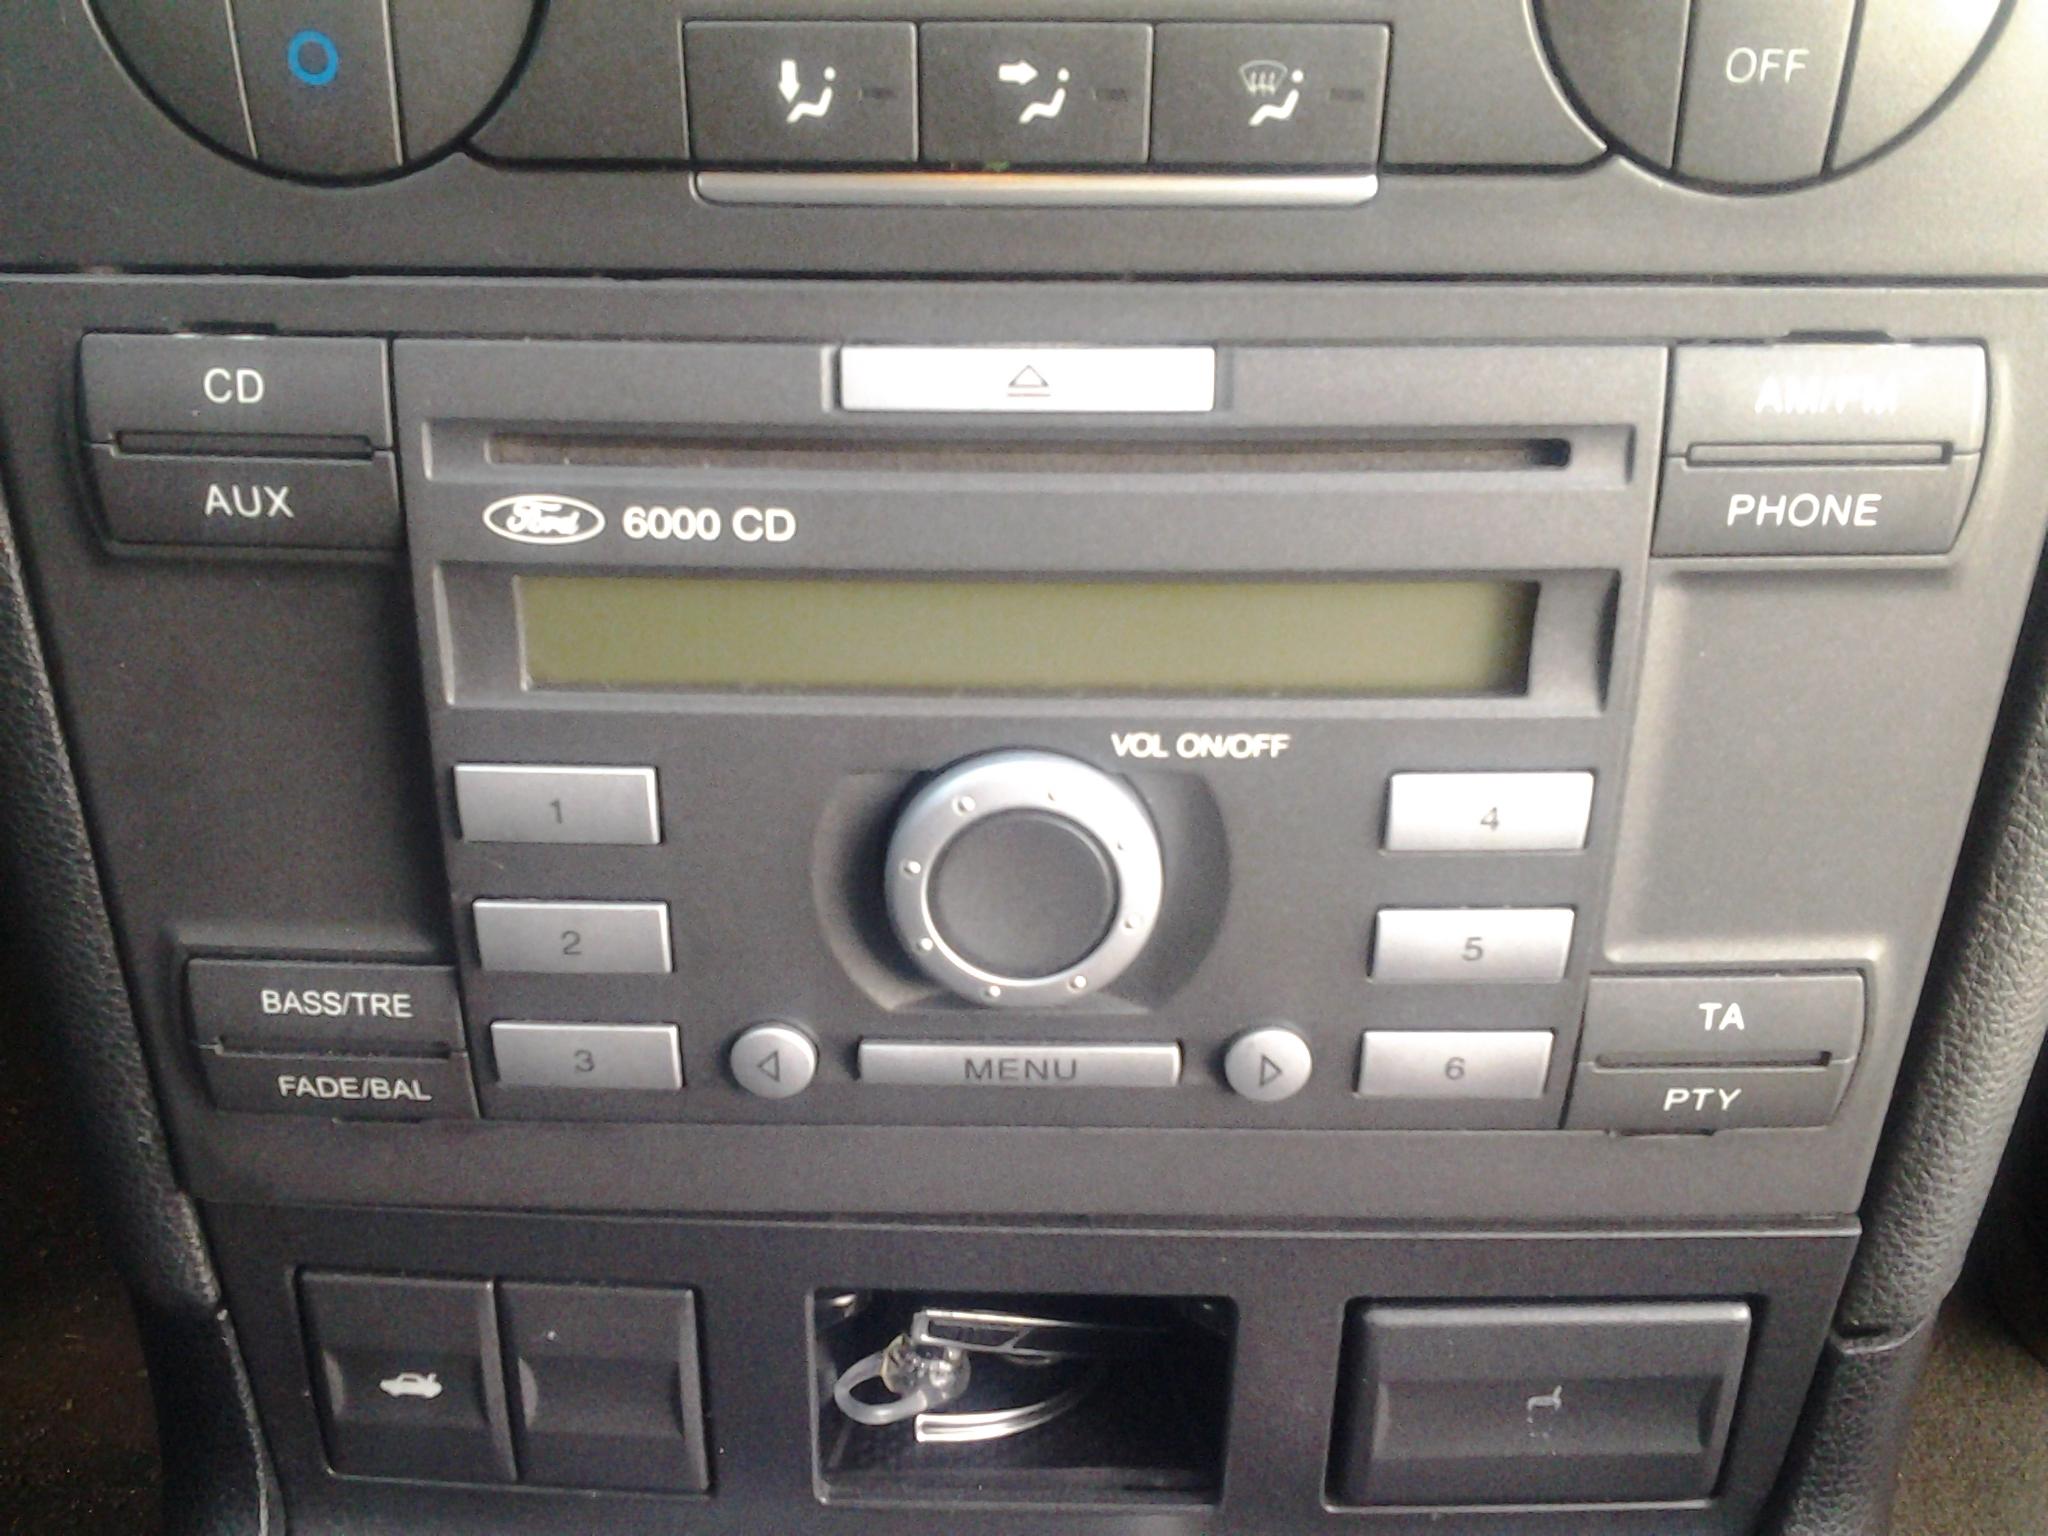 Zawiesza si� radio ford6000cd w mondeo mk3 2.0tdci